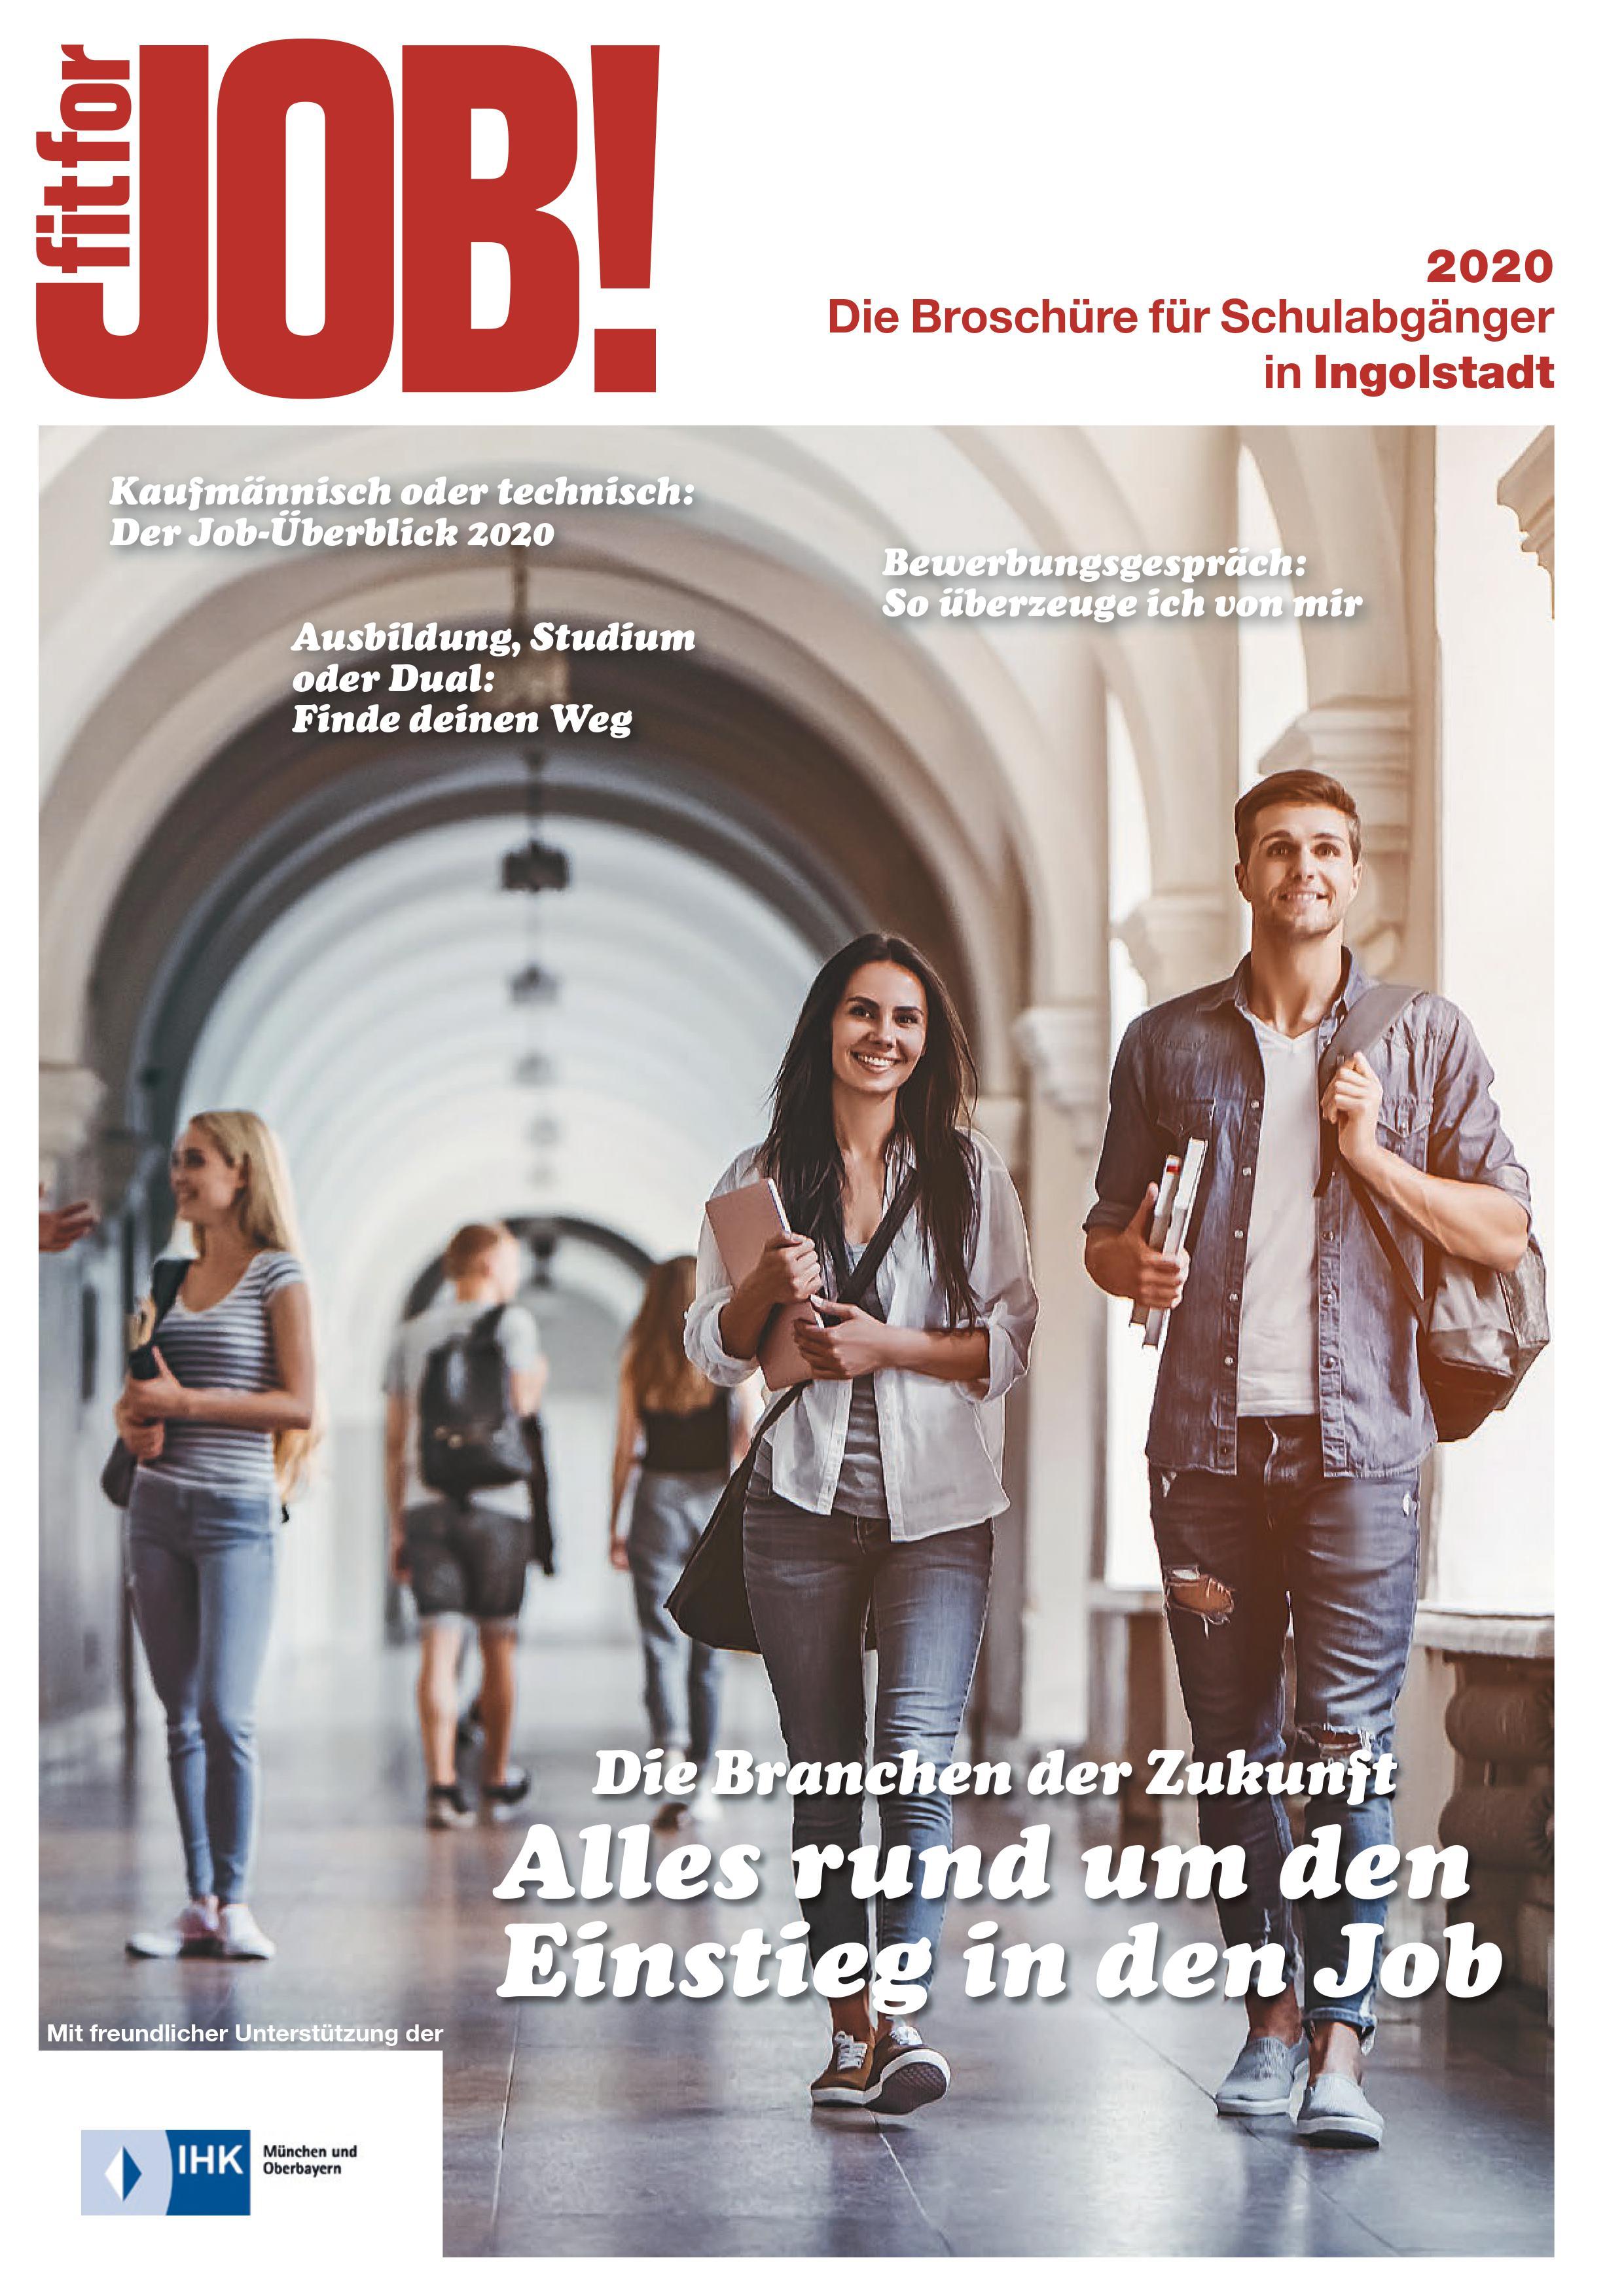 https://fitforjob-oberbayern.de/wp-content/uploads/2019/09/Ingolstadt-2020.jpg